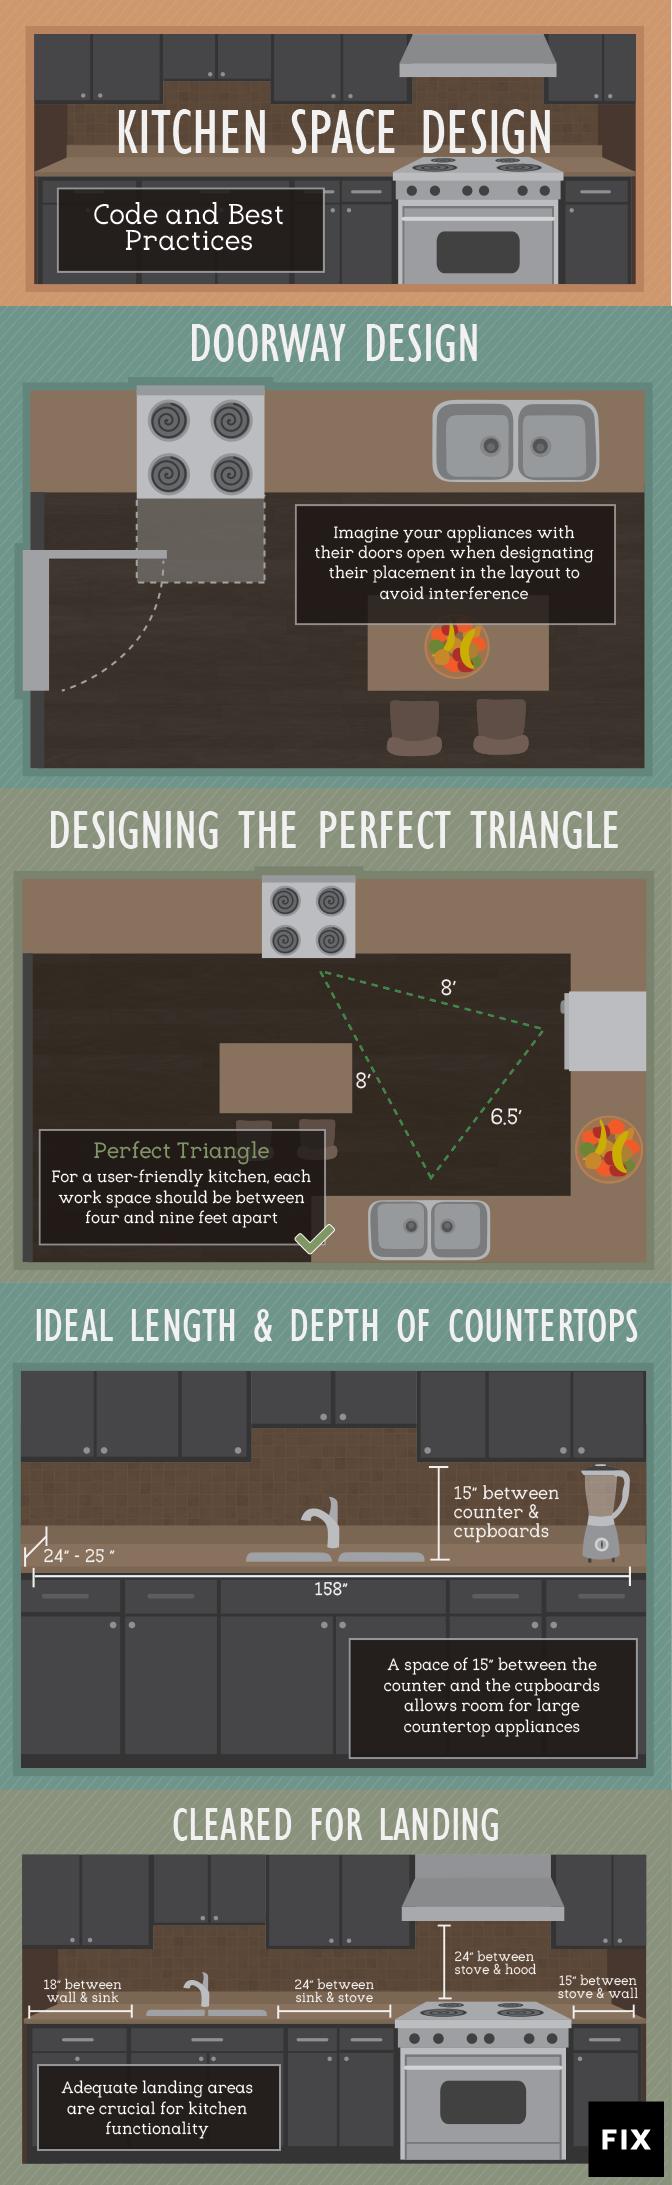 kitchen design layout | kitchen designs layout, kitchen